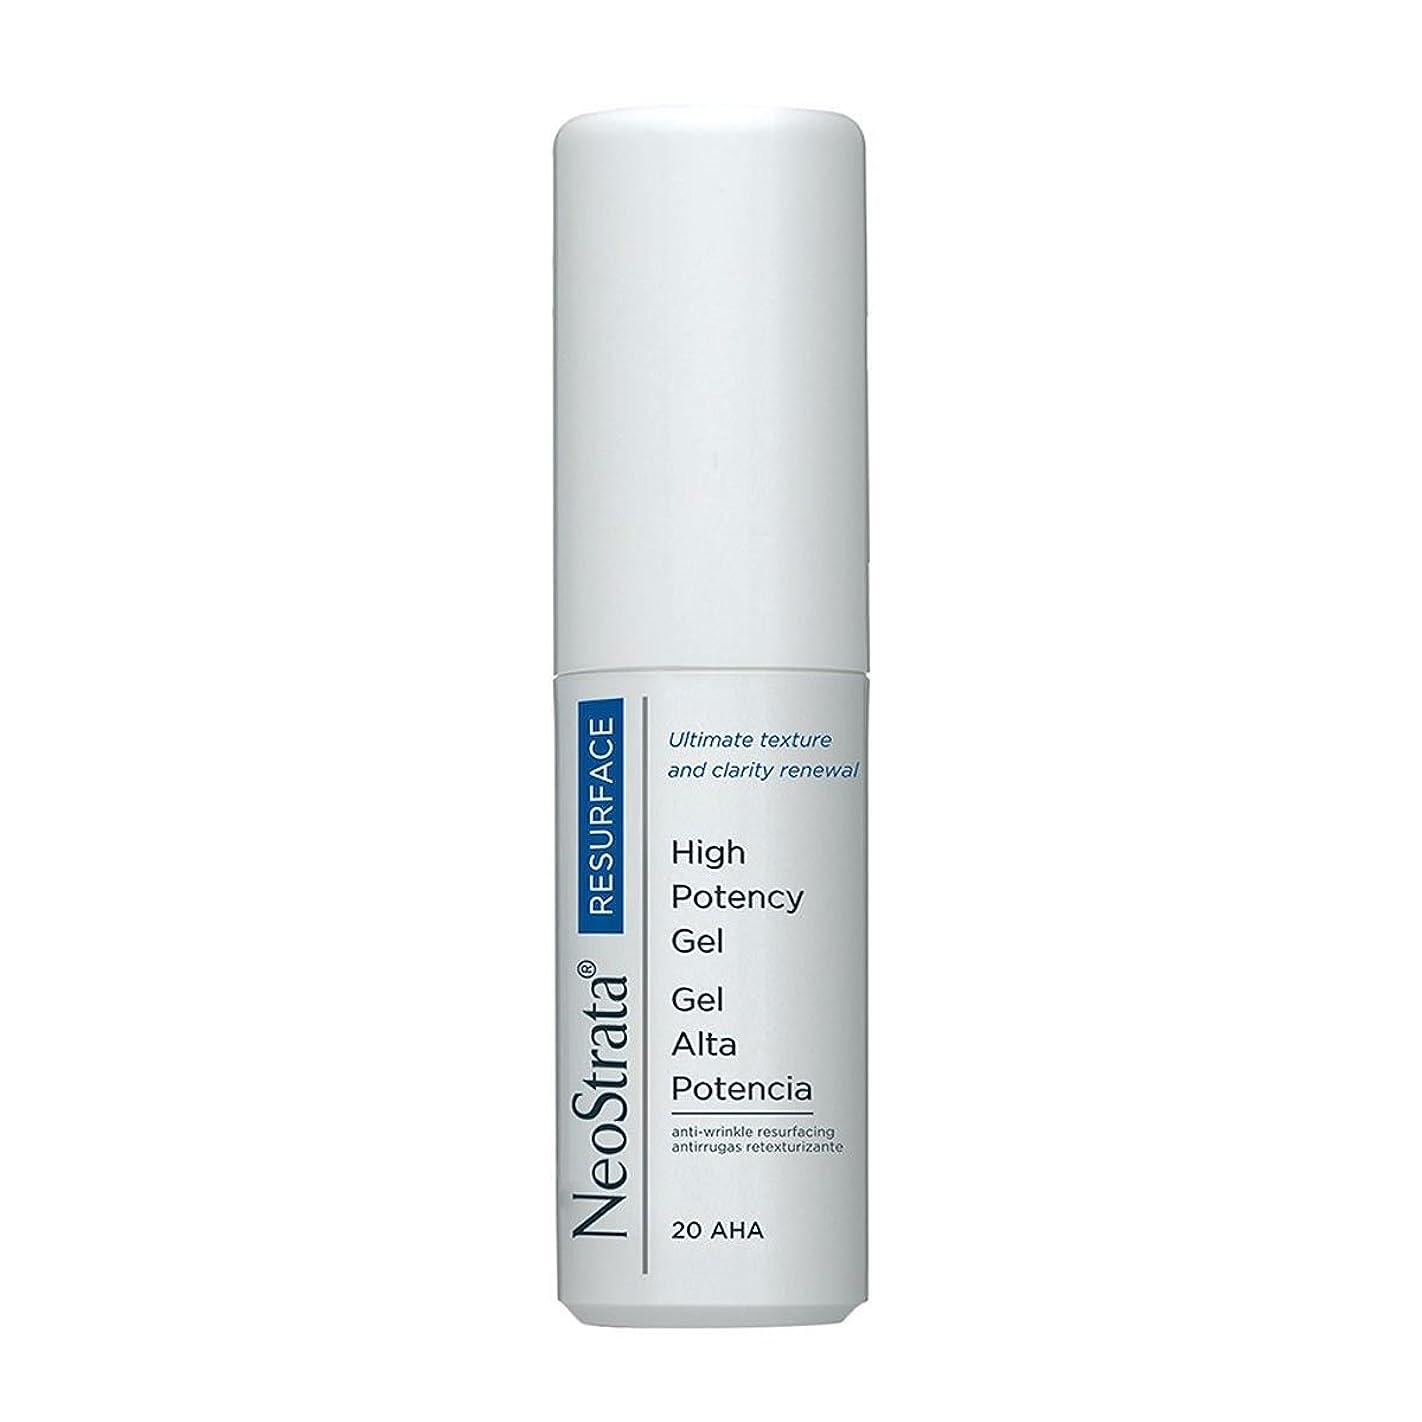 設計承認予定Neostrata High Potency Gel Anti-wrinkle Resurfacing Moisturizing 30ml [並行輸入品]